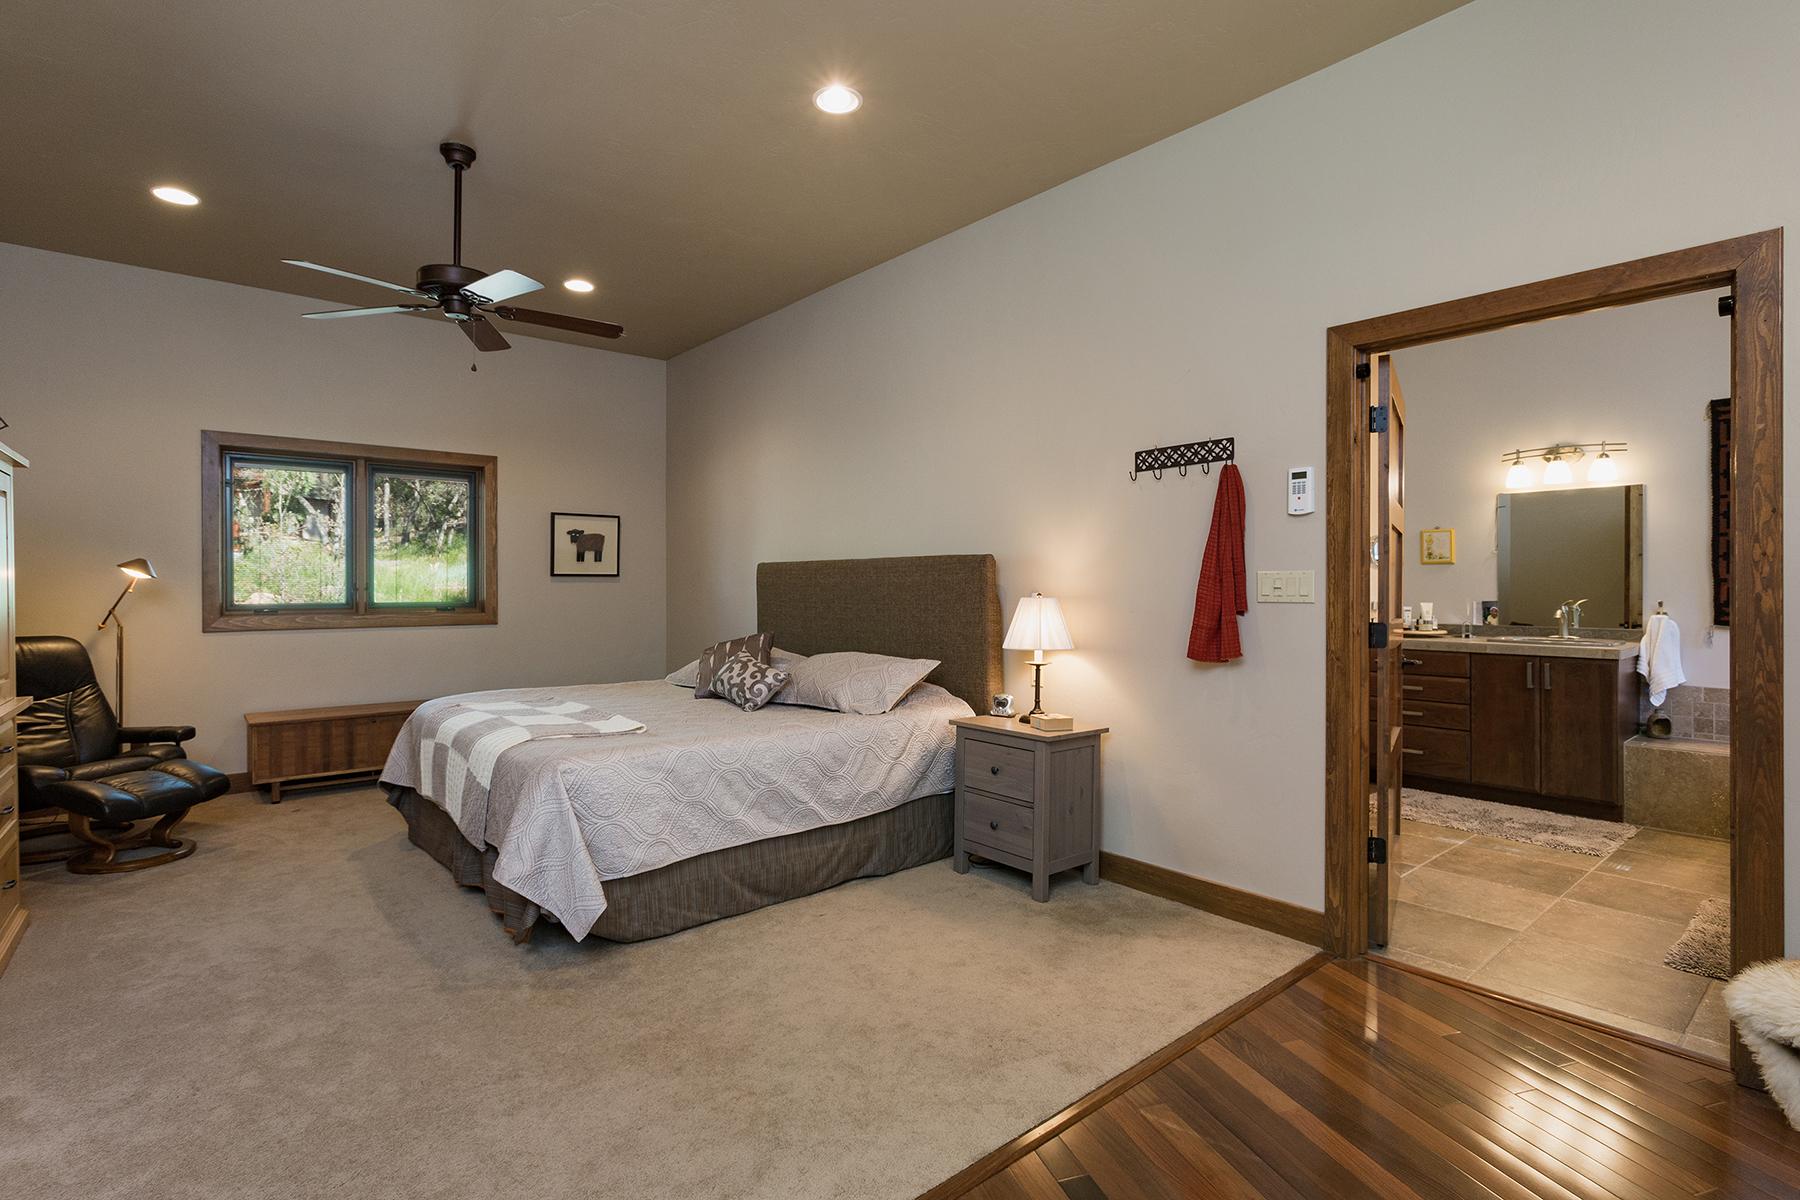 Additional photo for property listing at 389 Window Lake Trail 389 Window Lake Trail Durango, Colorado 81301 United States